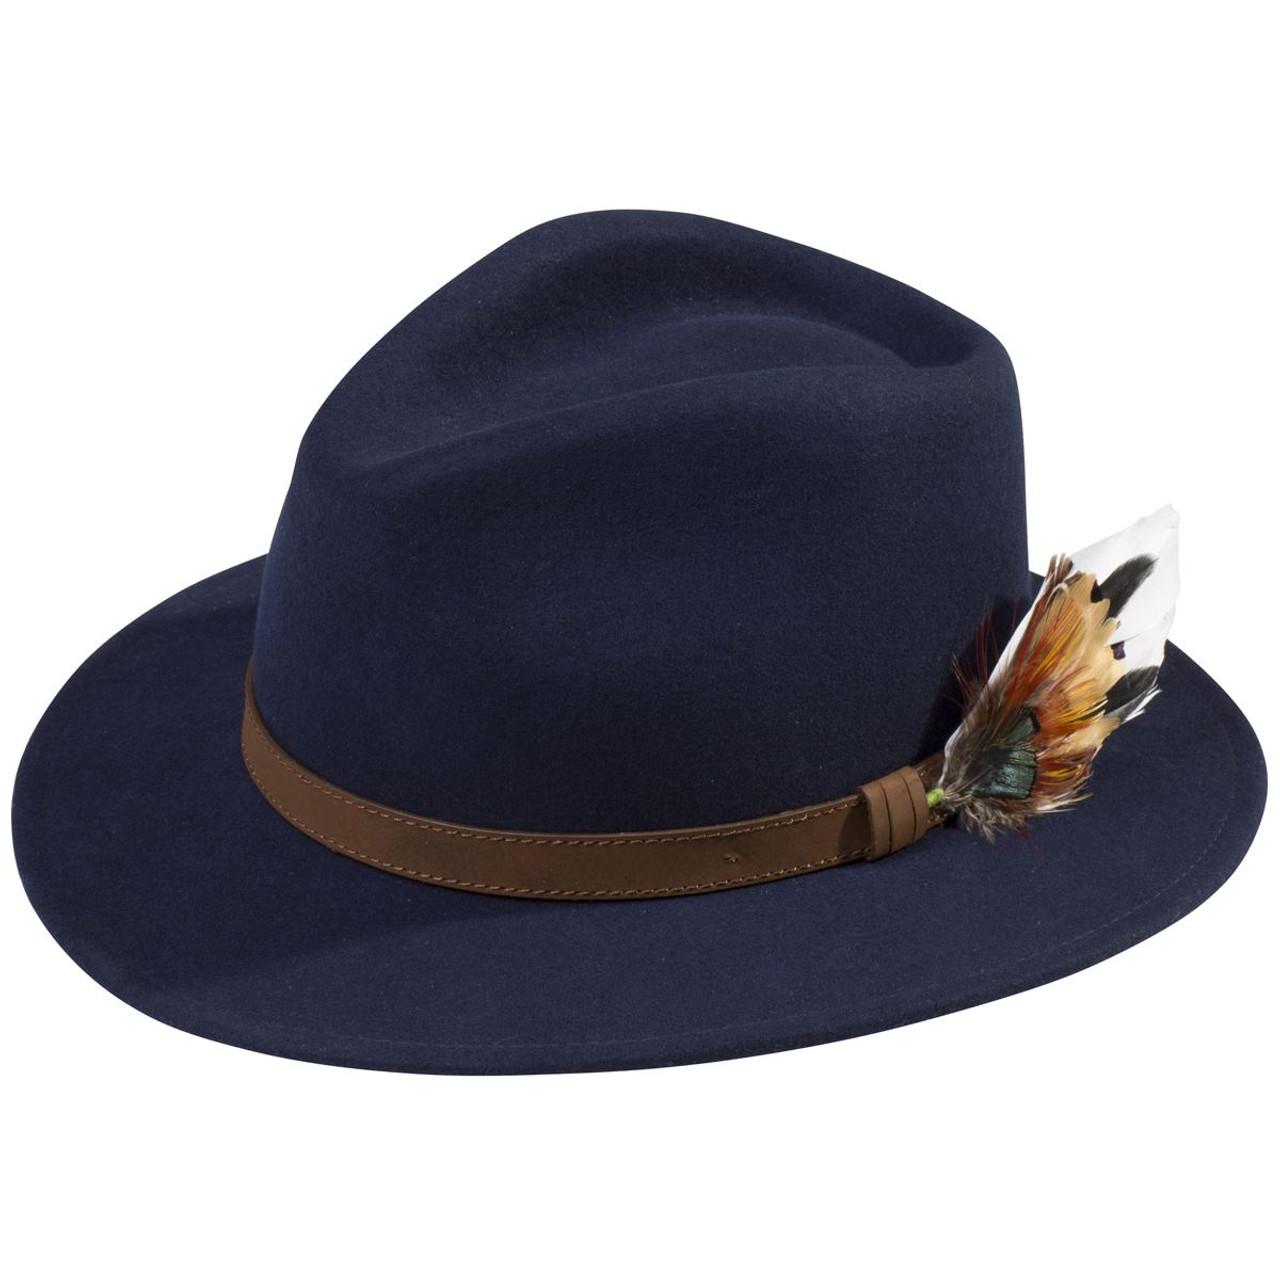 Navy Alan Paine Unisex Richmond Felt Hat